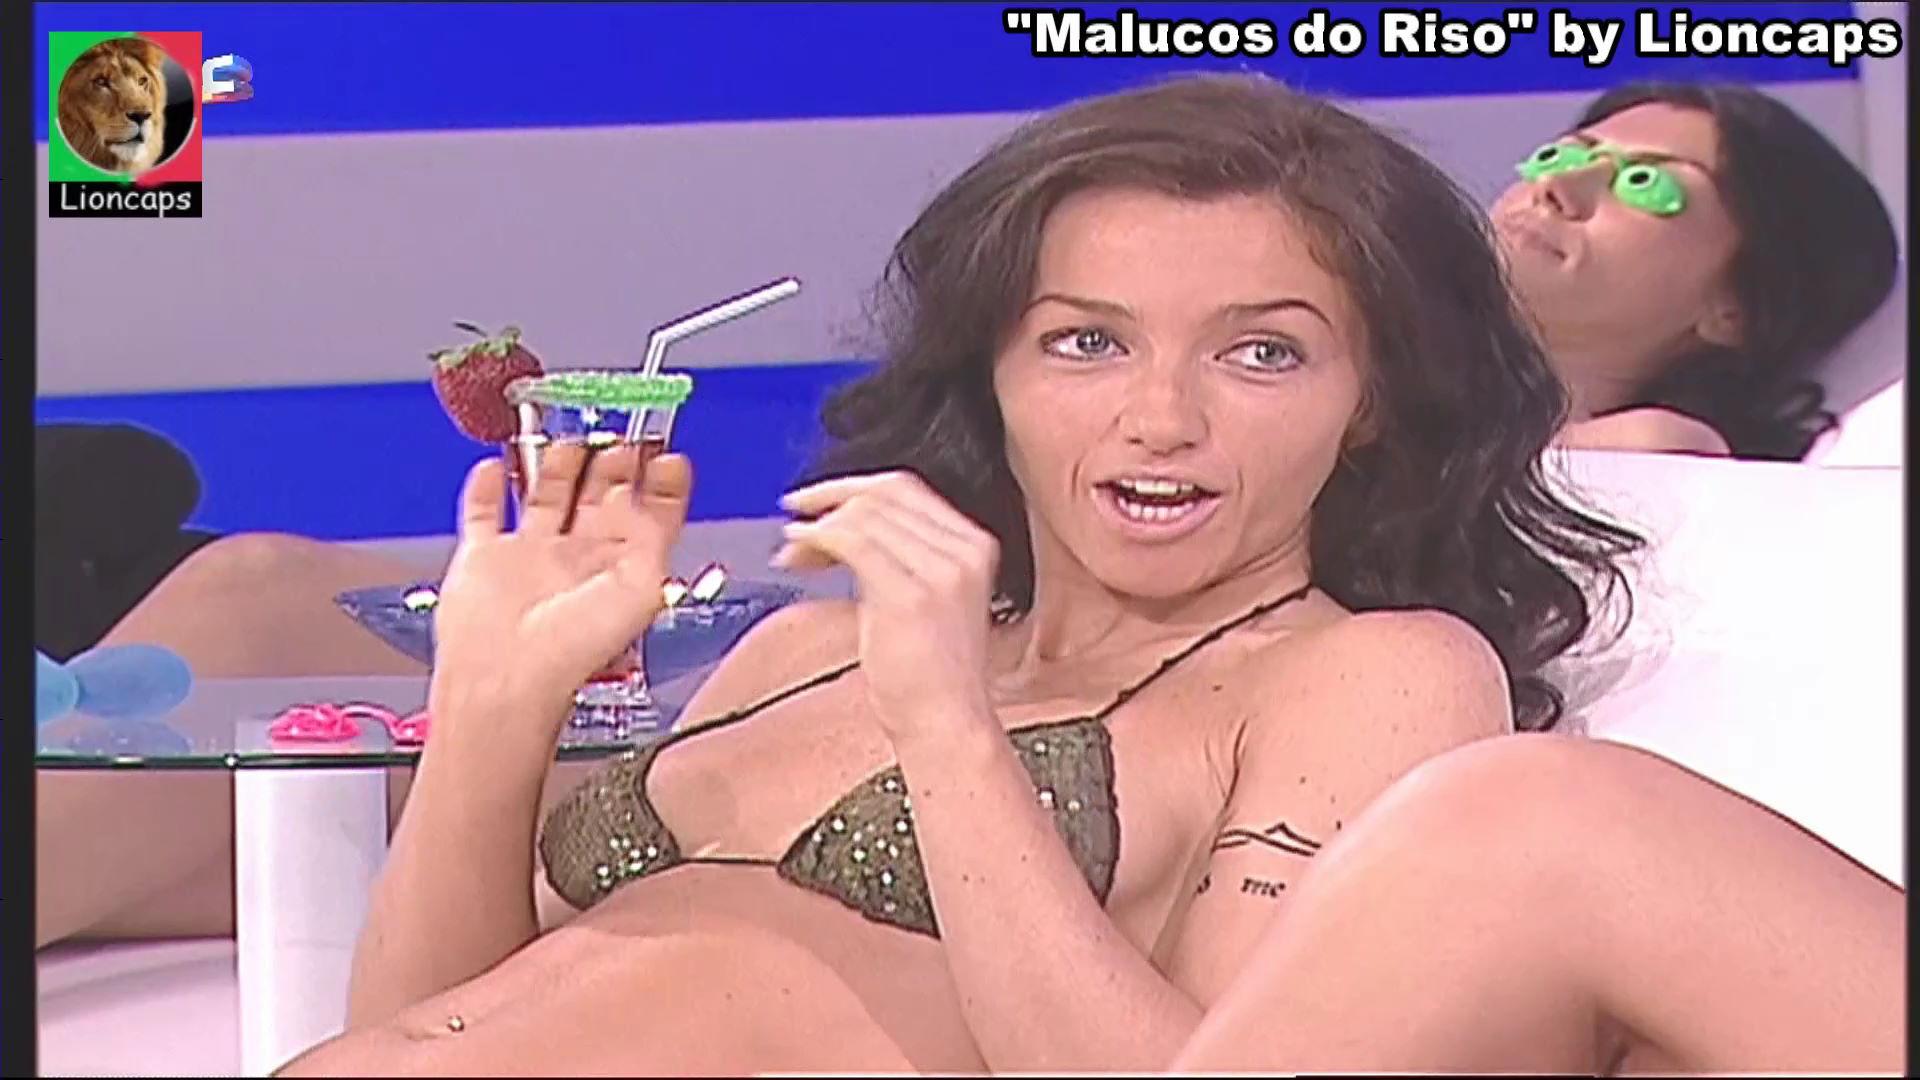 475201404_malucos_riso_alda_gomes_vs190malucos_riso_602_15096_122_393lo.JPG